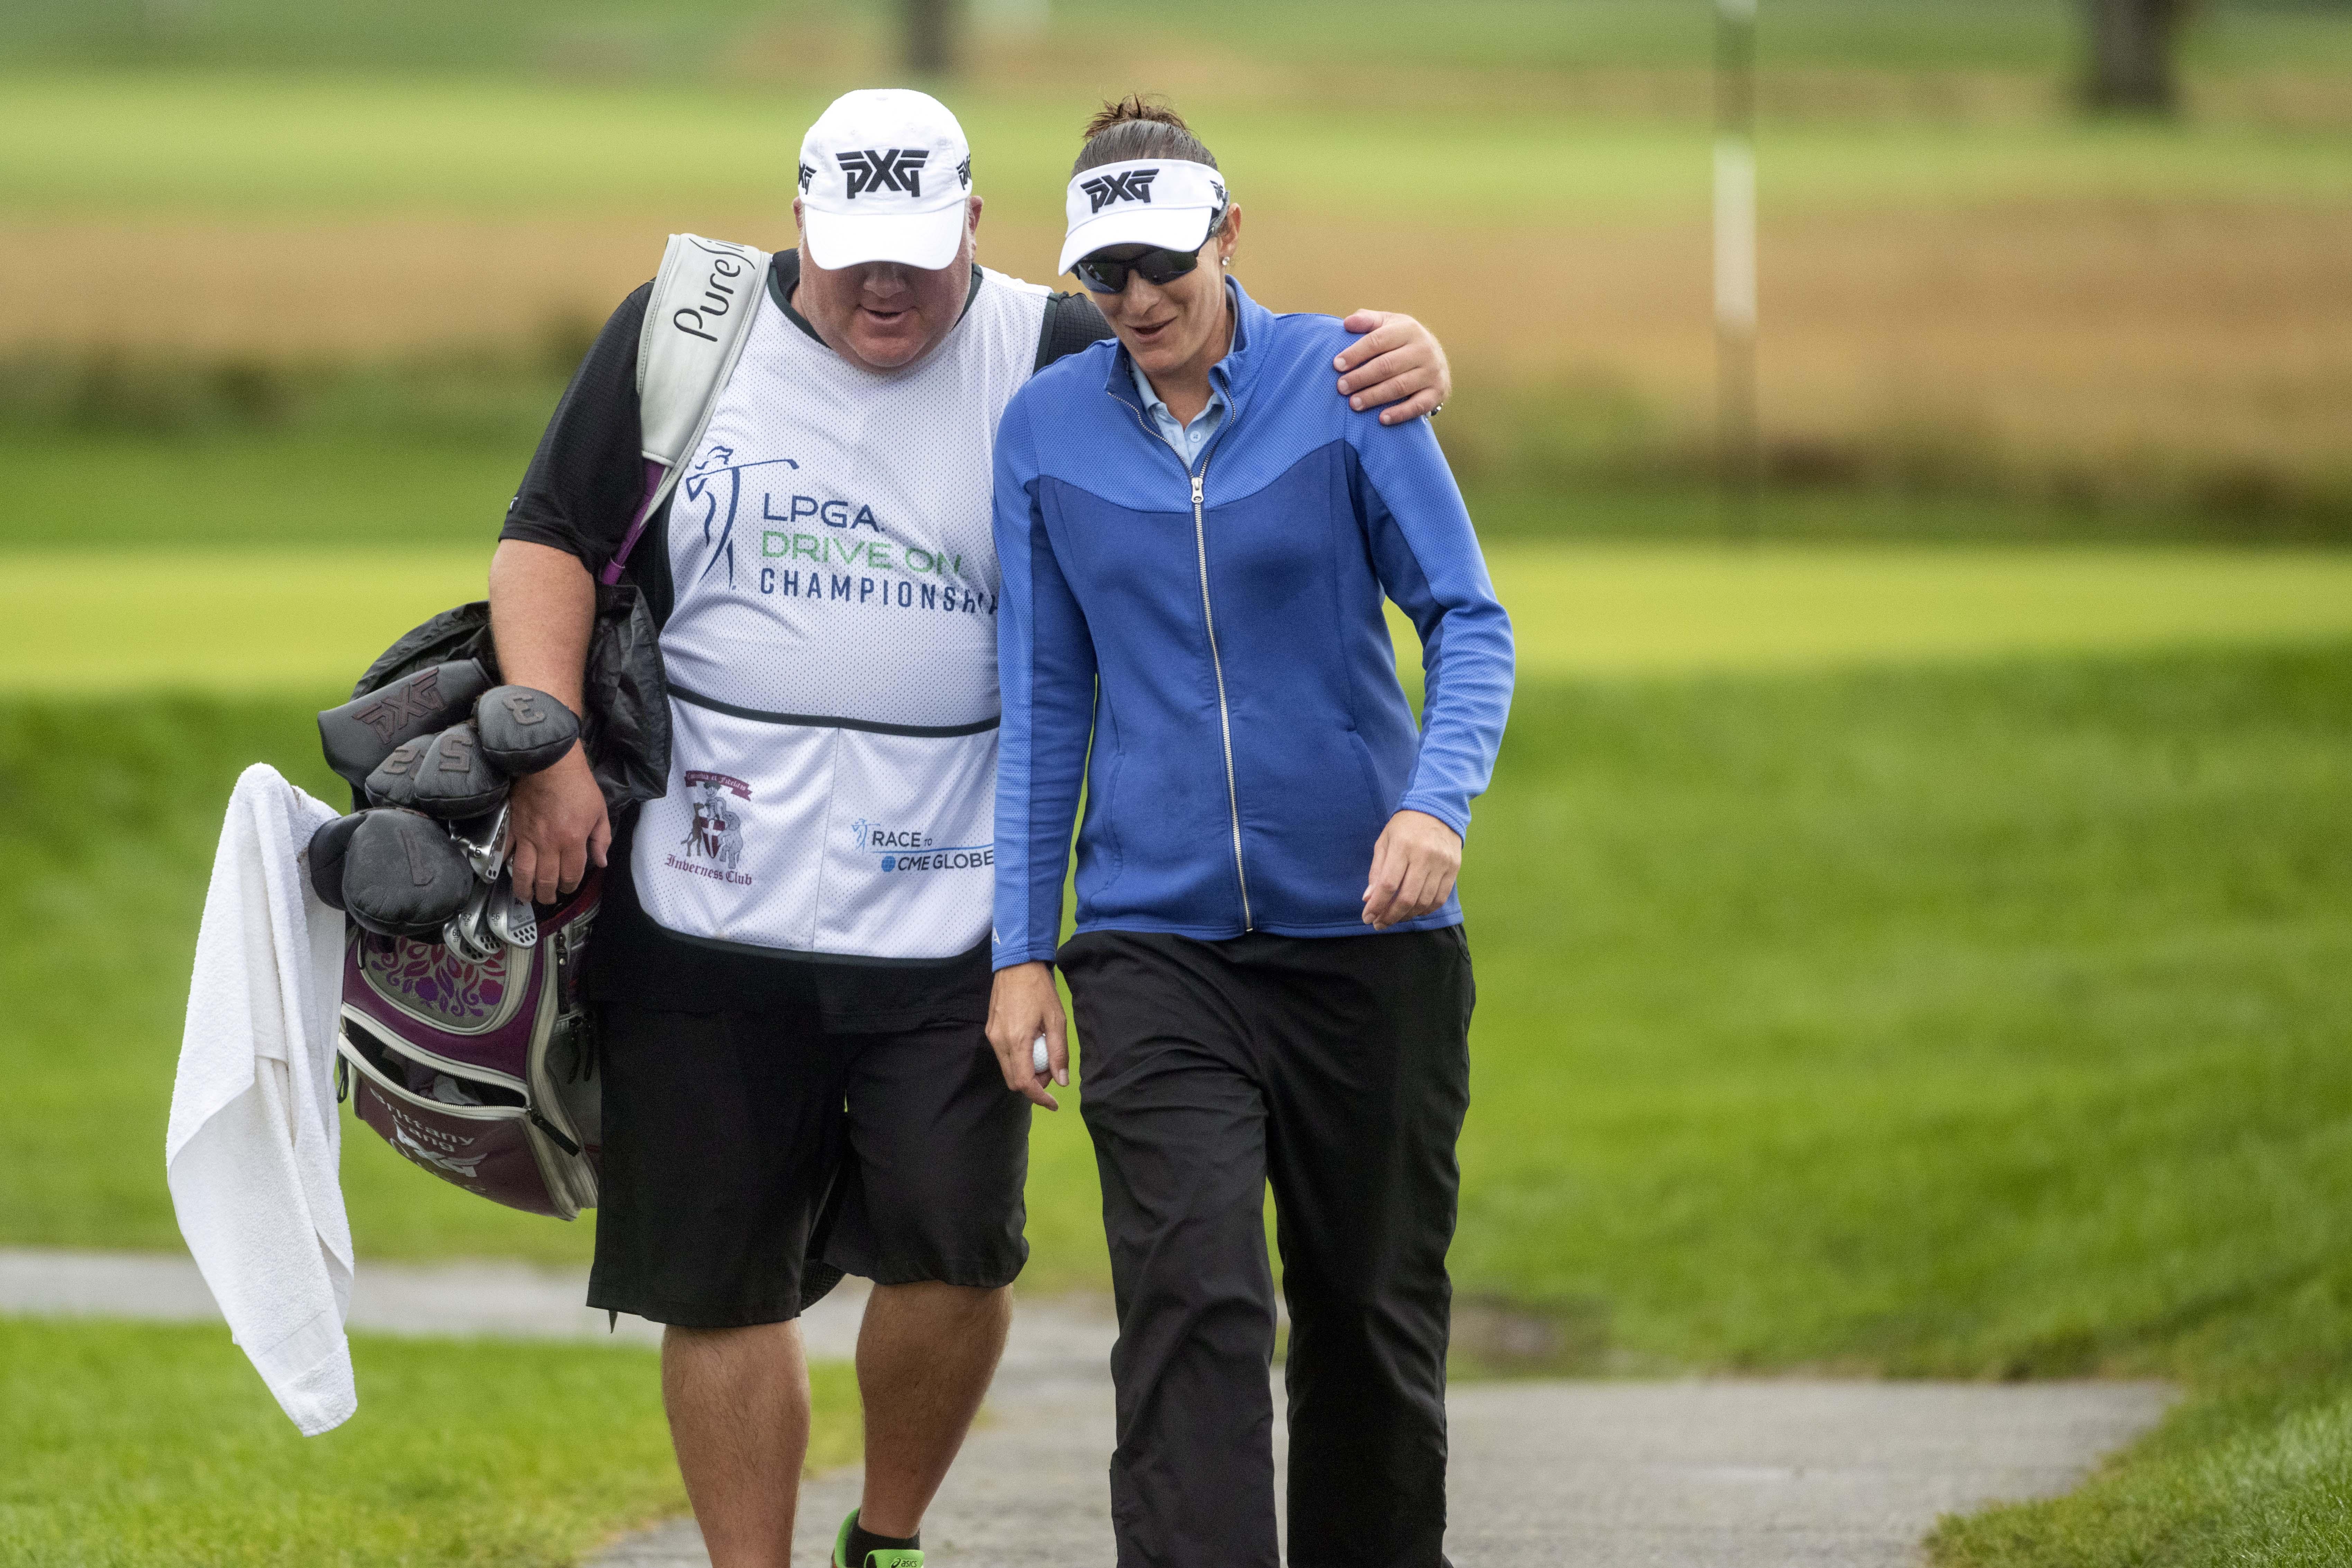 LPGA: LPGA Drive Championship - Second Round